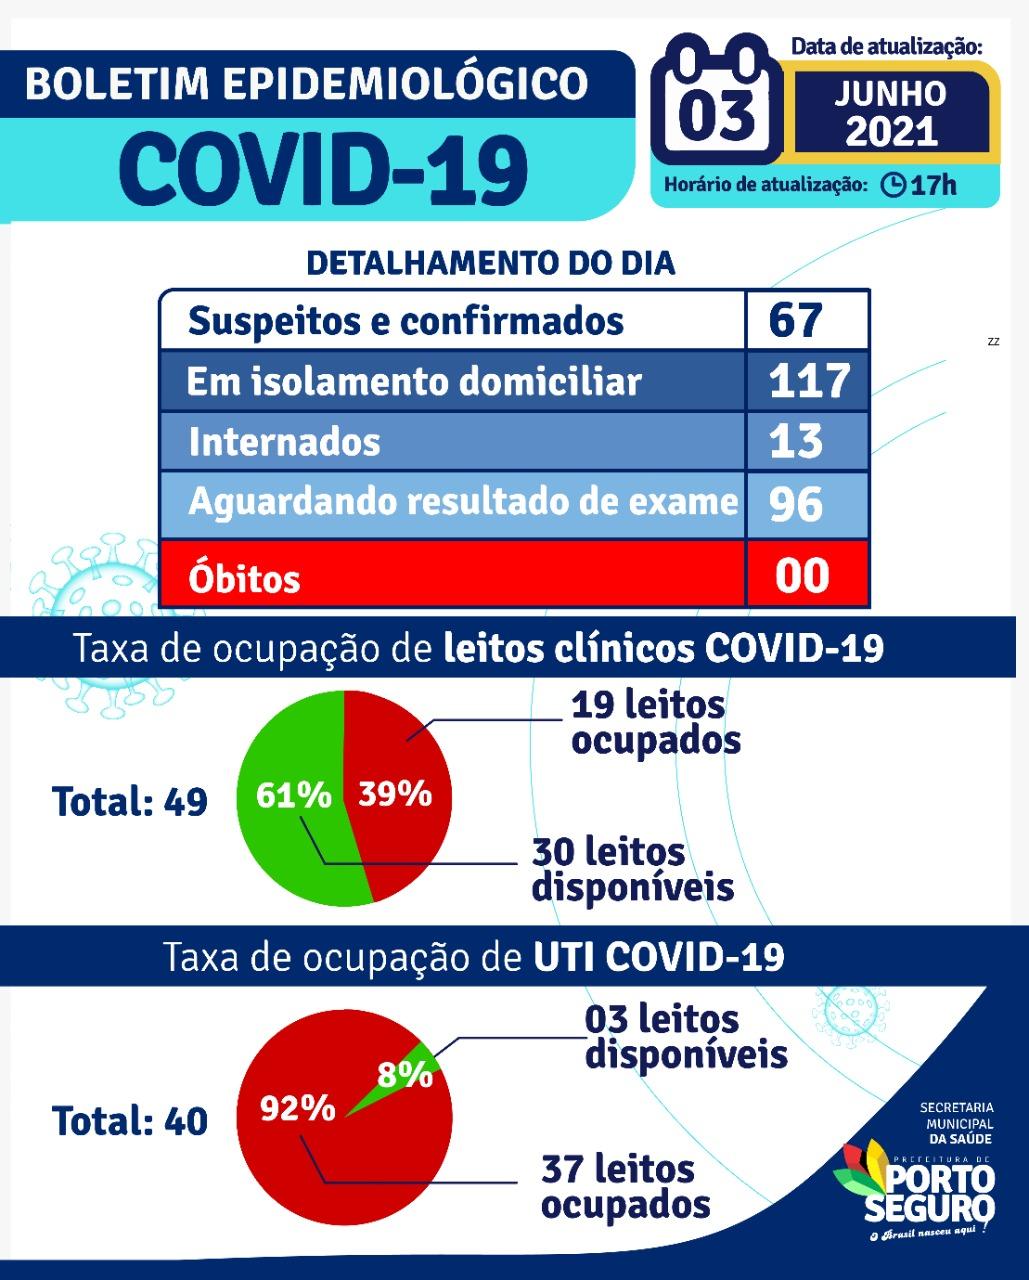 Porto Seguro: Boletim Epidemiológico Covid-19 (03/Junho) 22